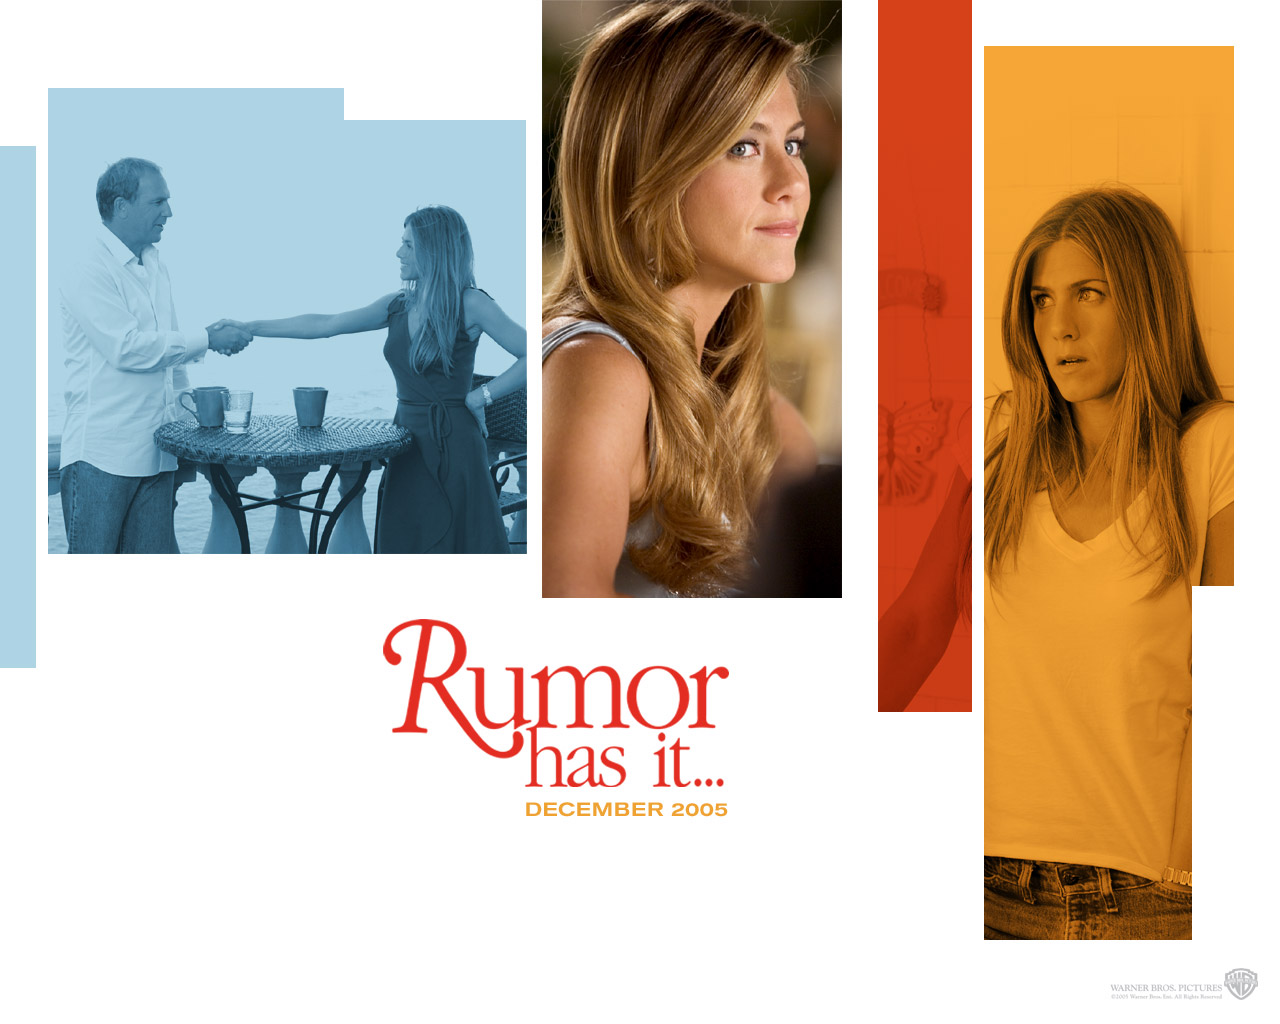 Rumor has it 1